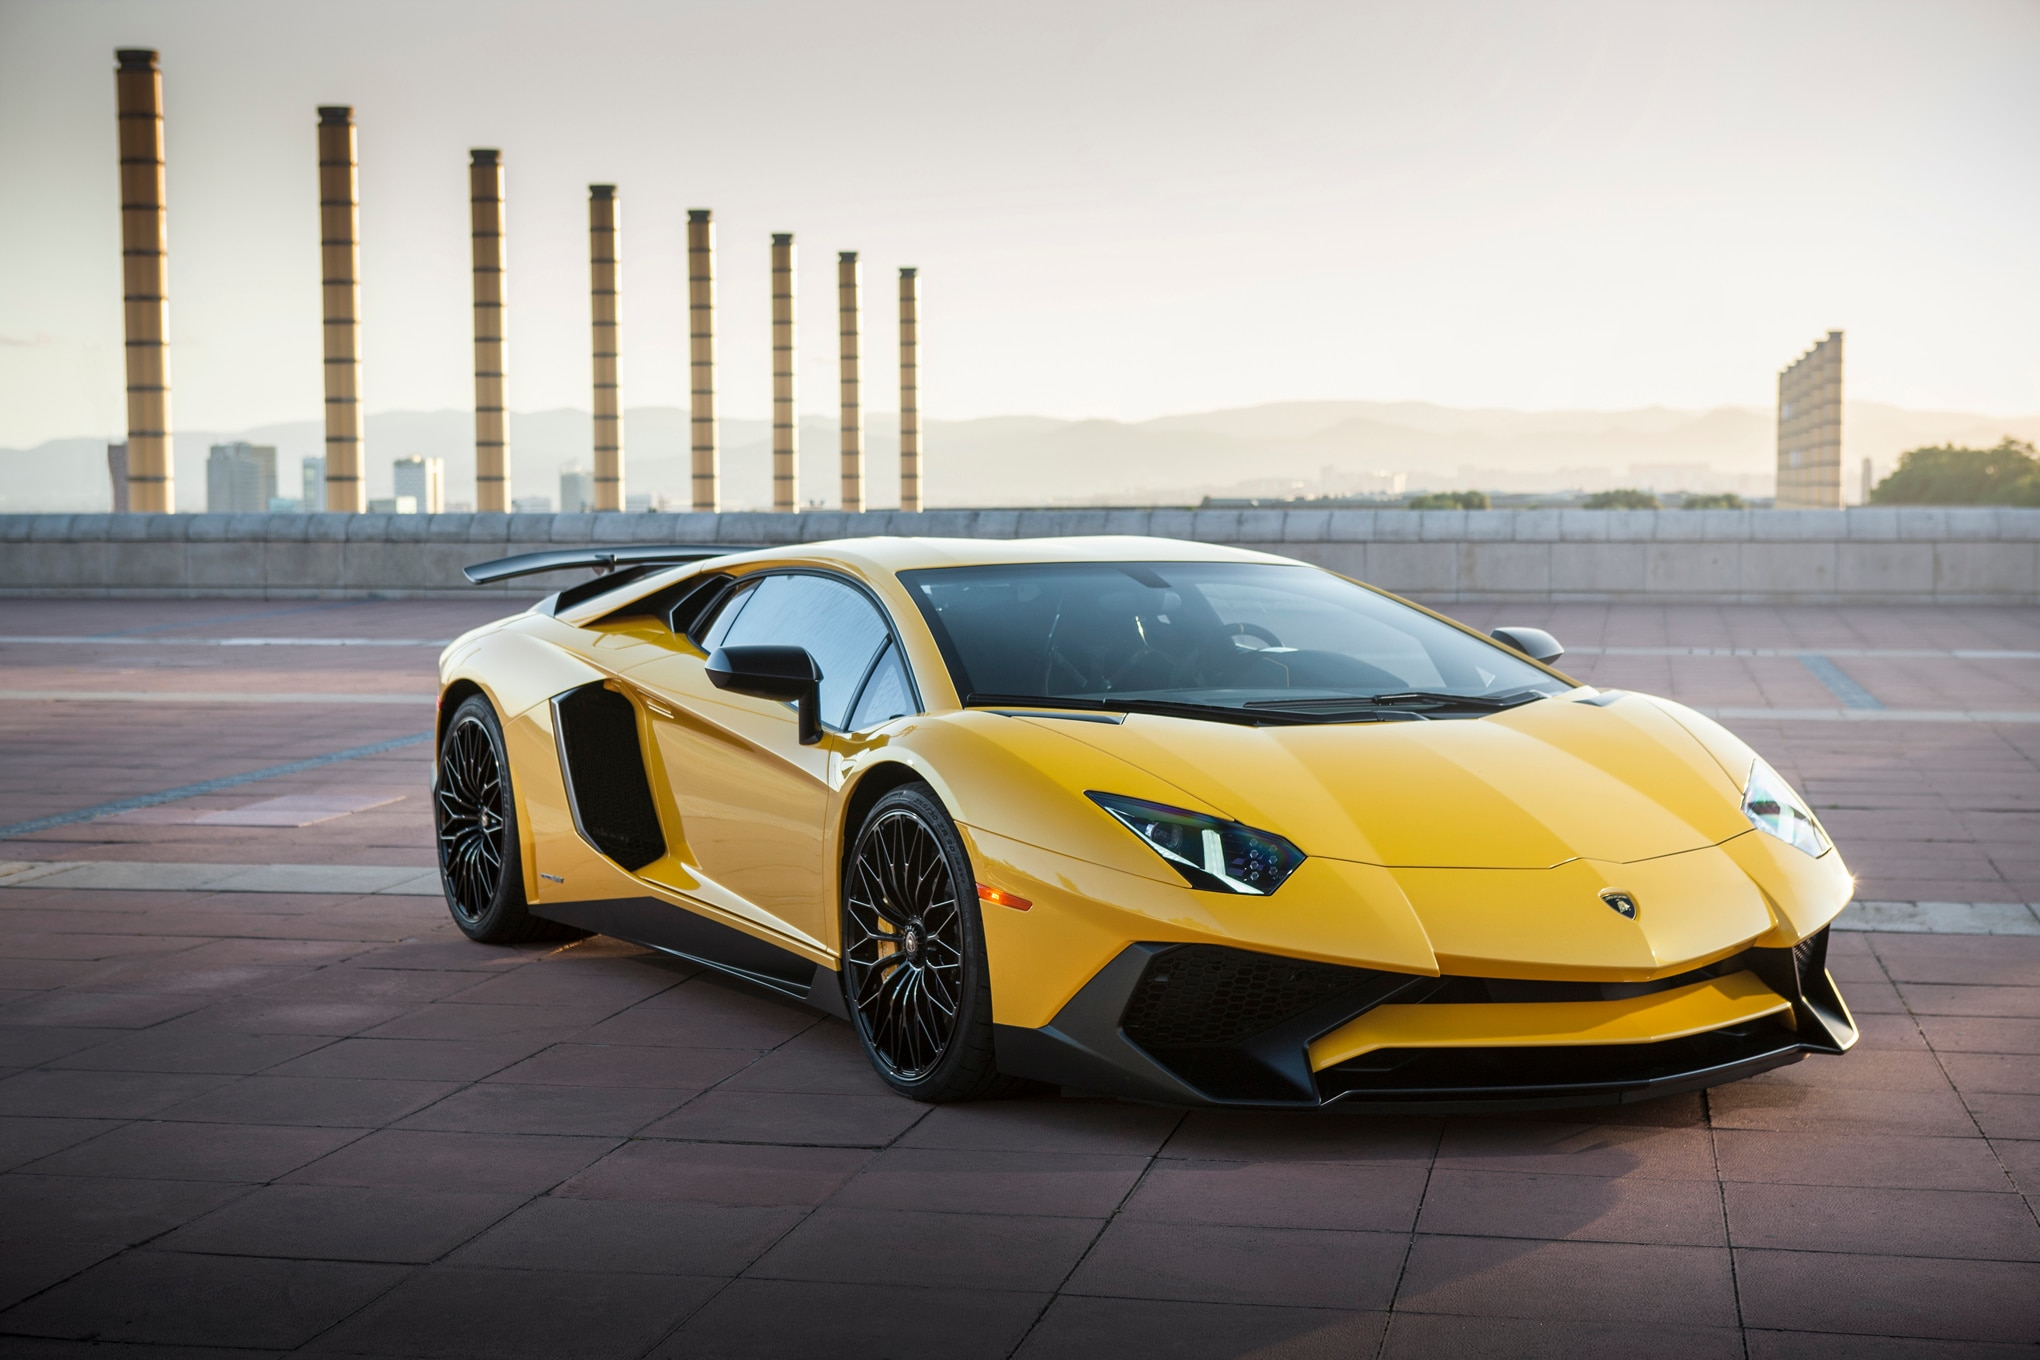 Season Five Of Ignition Begins With Lamborghini Aventador